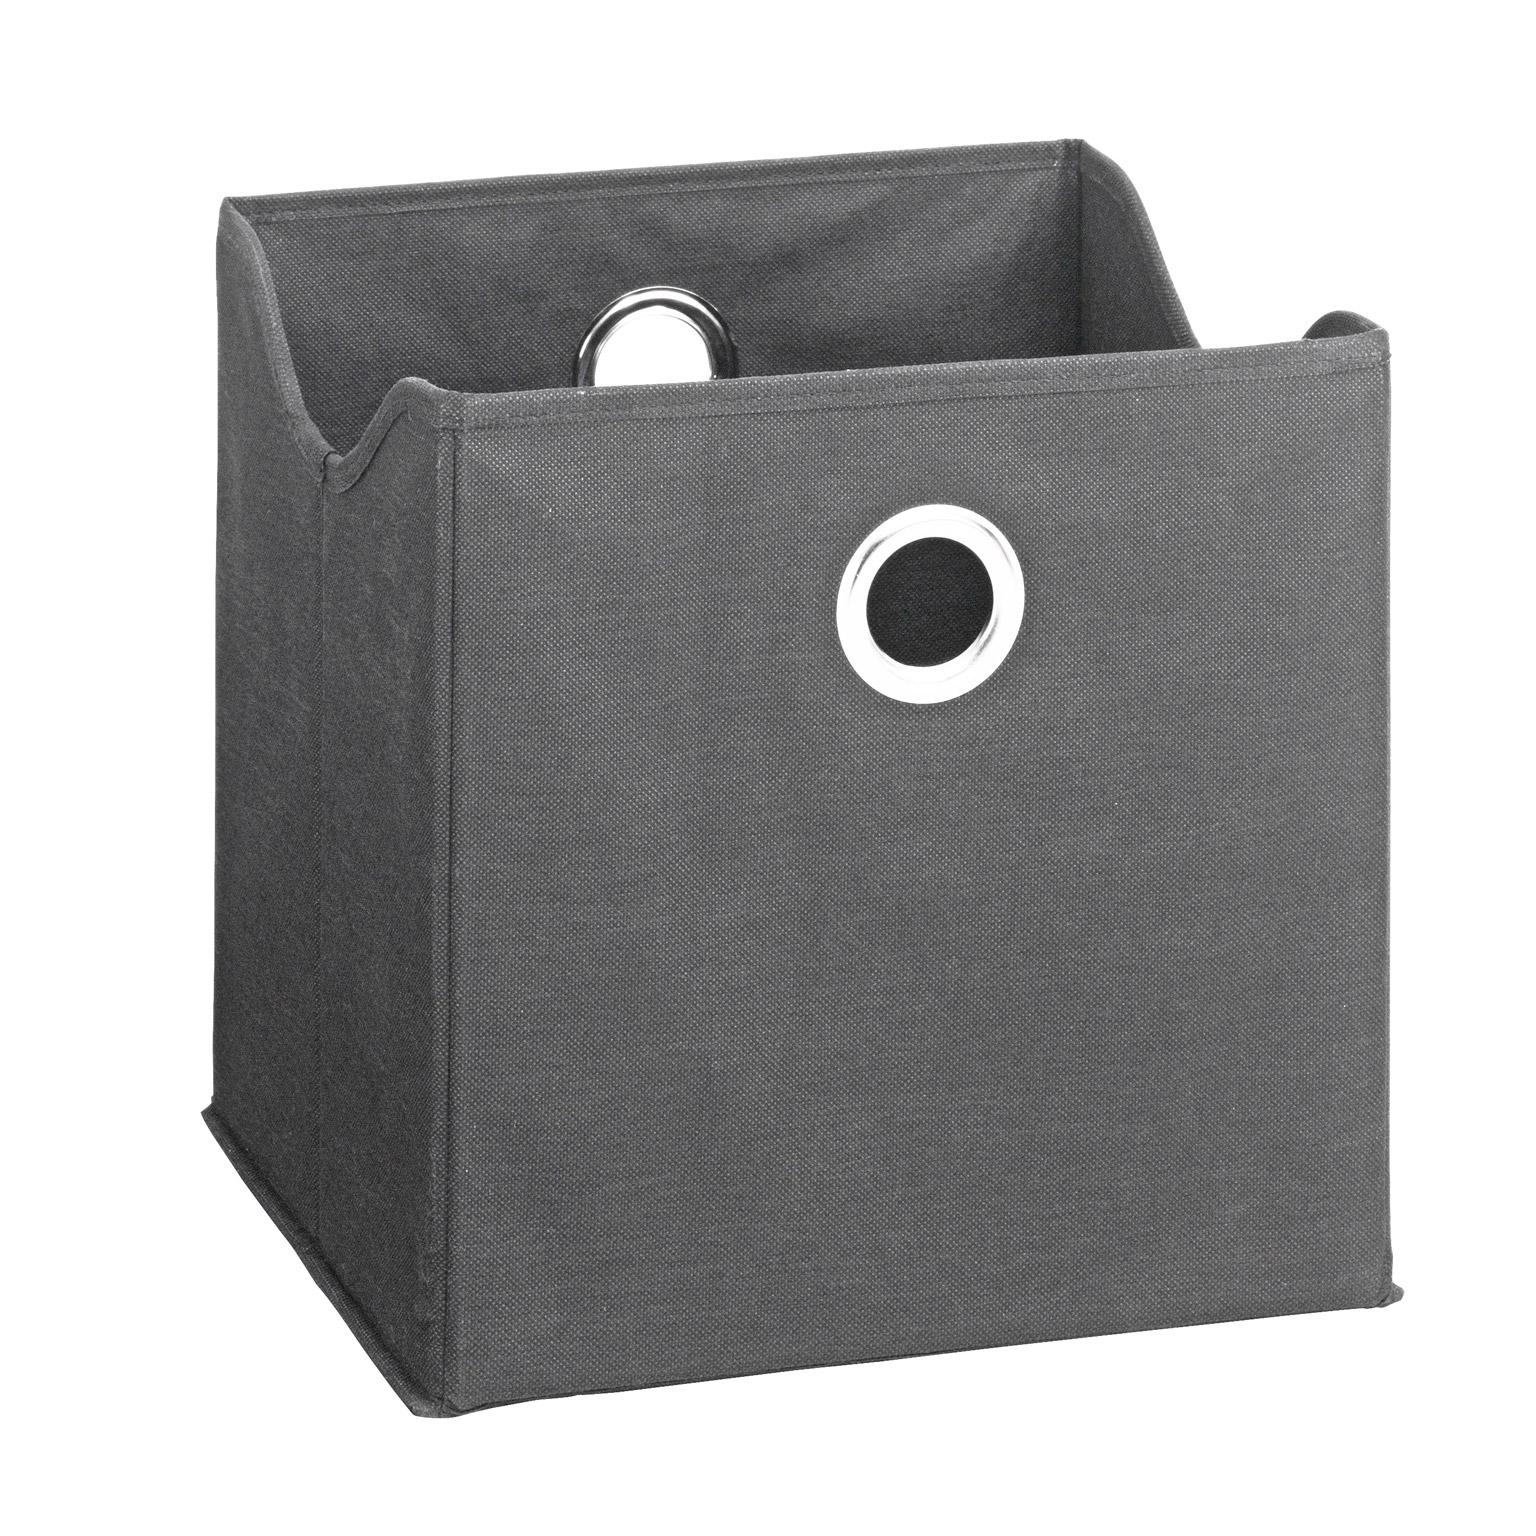 Box Combee (grau)